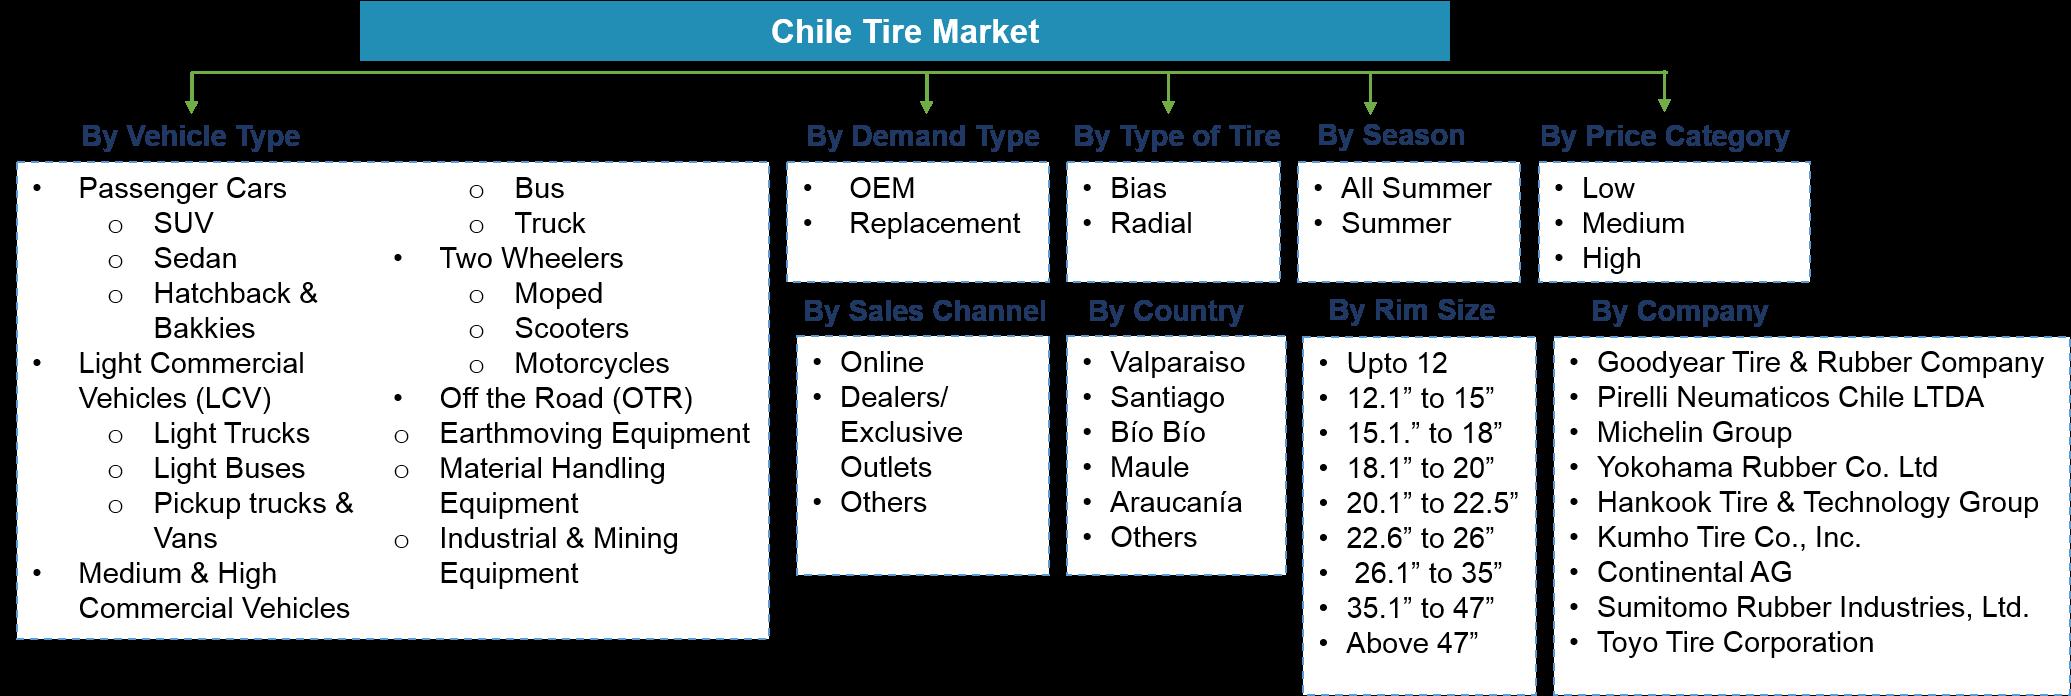 Chile Tire Market Segentation